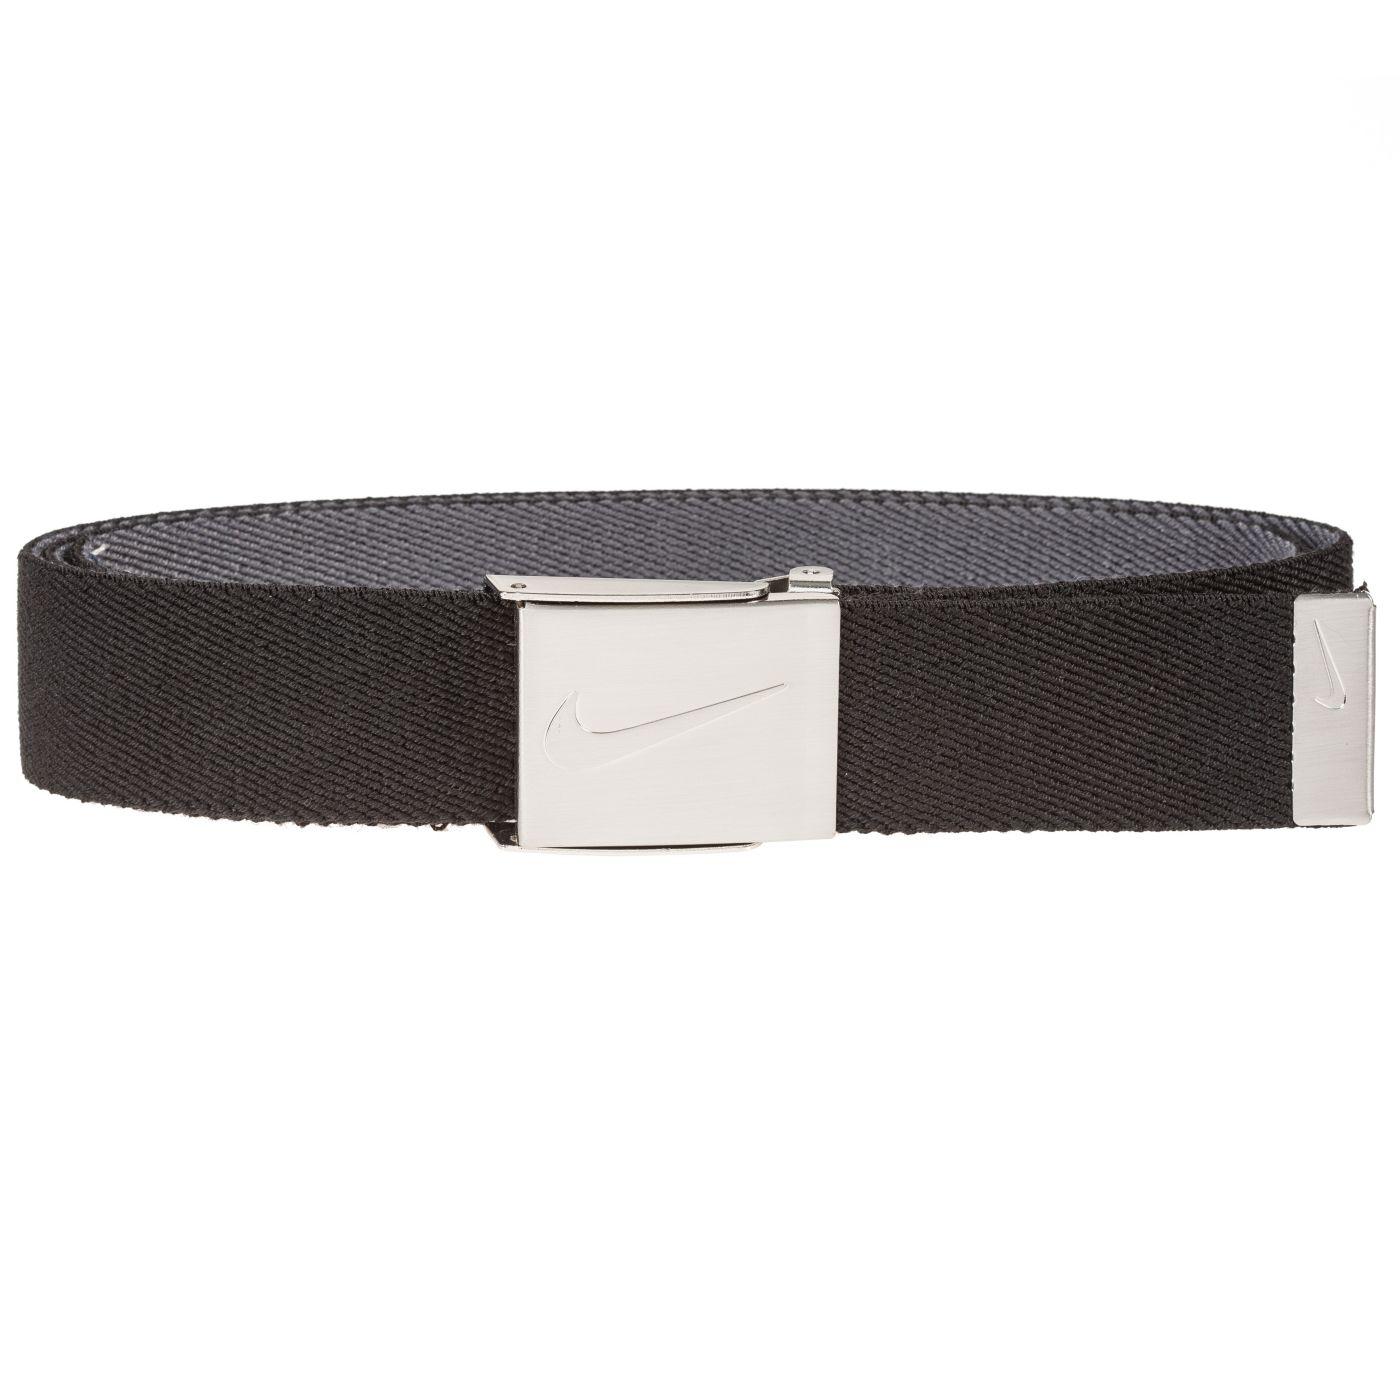 Nike Men's Reversible Stretch Webbing Golf Belt